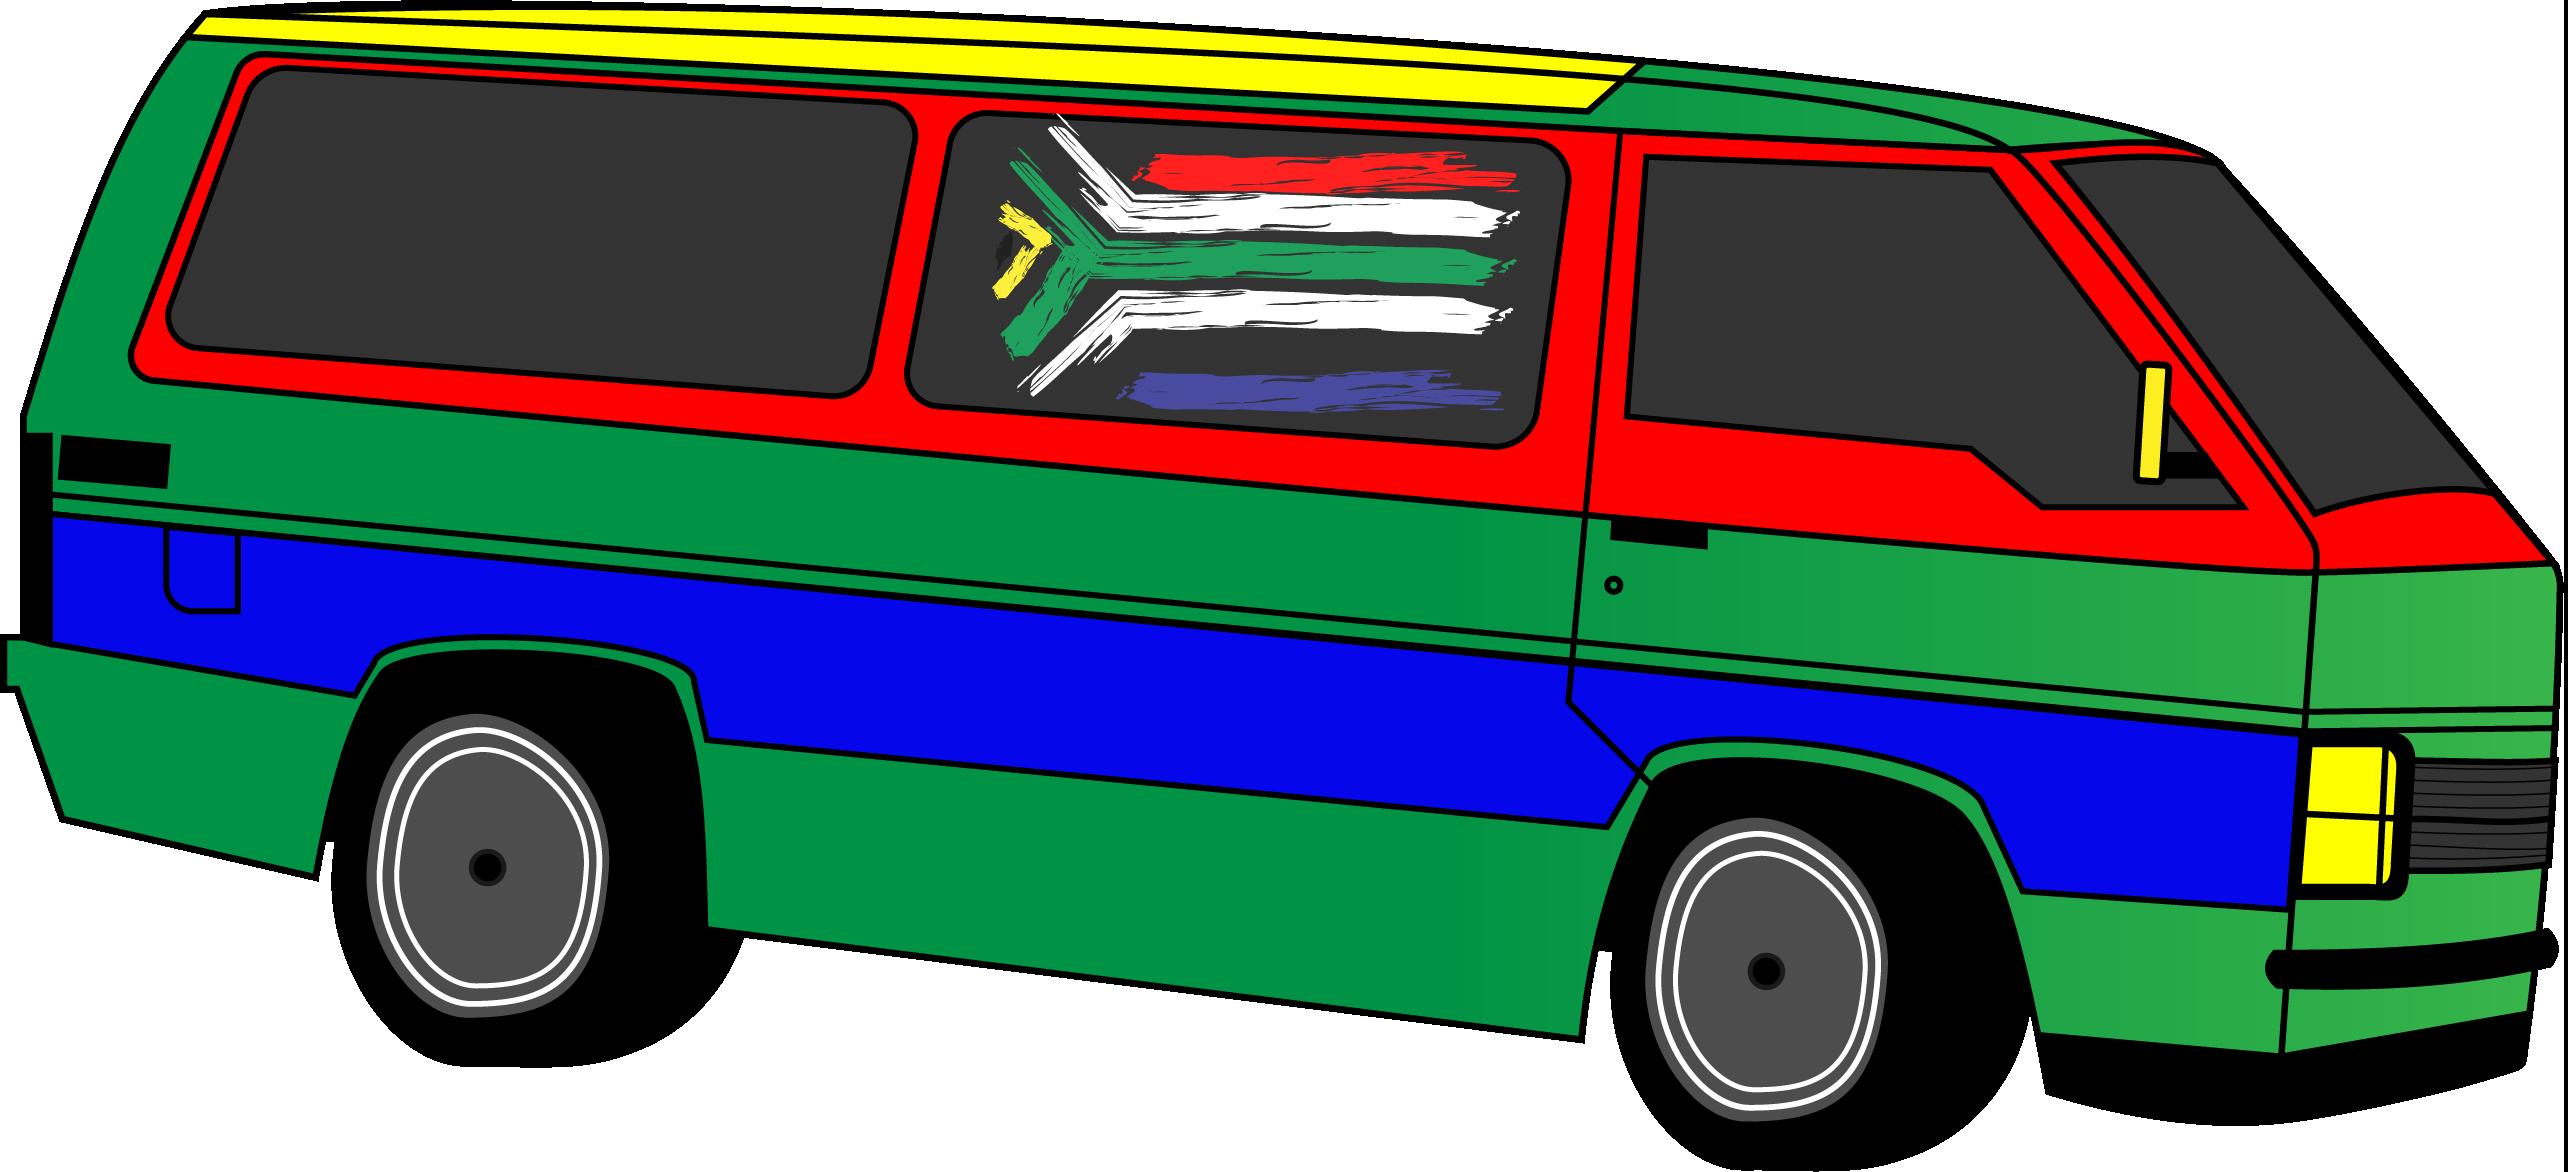 Little South Africa messages sticker-5